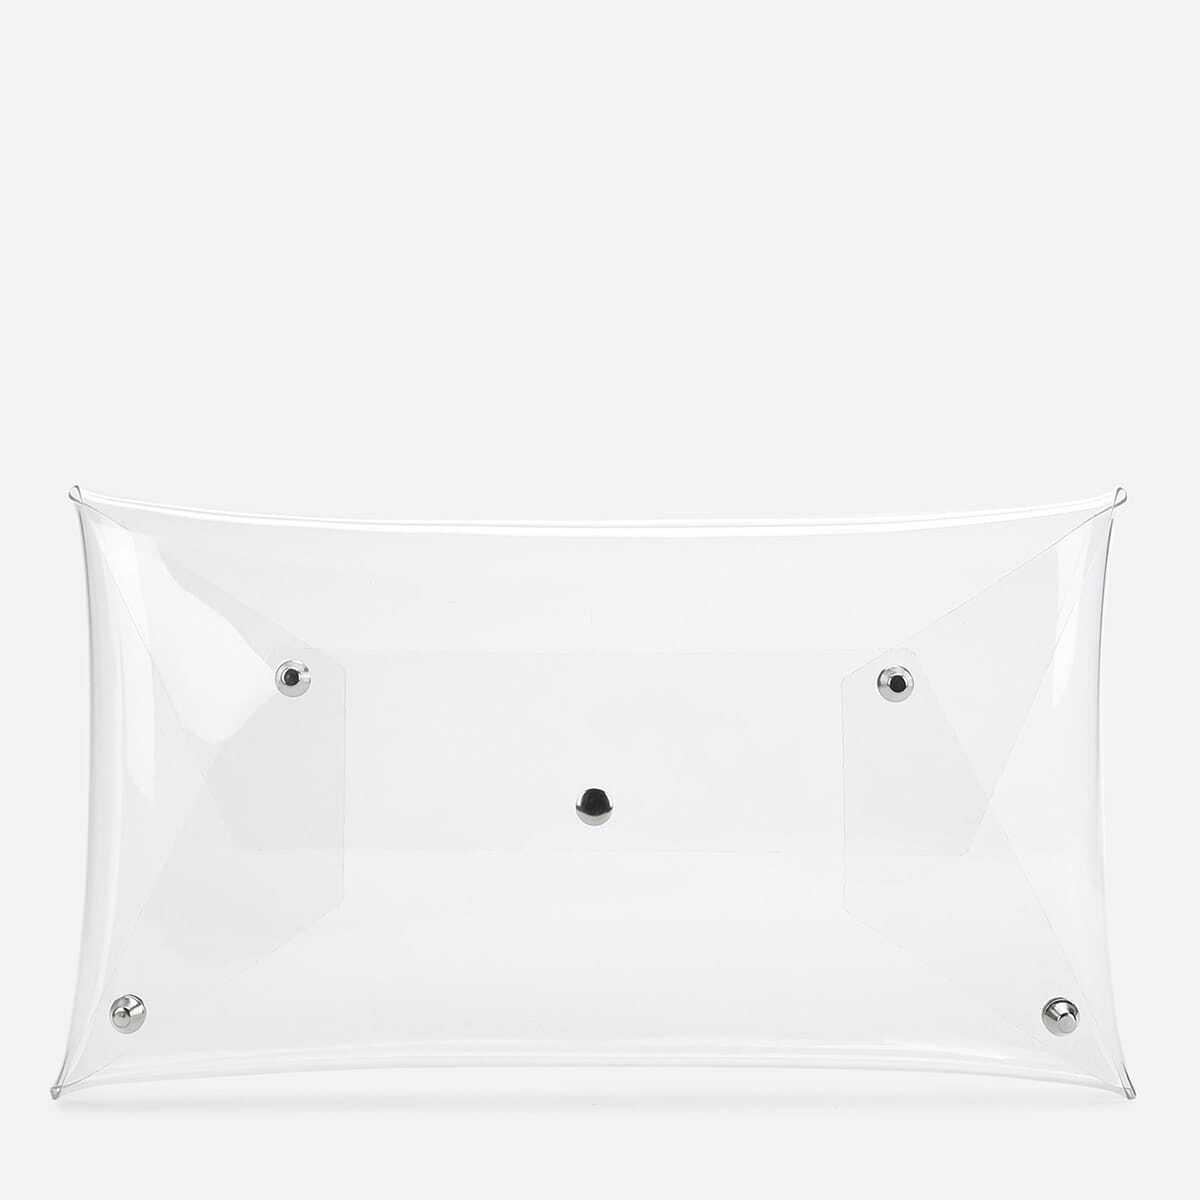 - PVC Clear Clutch Bag